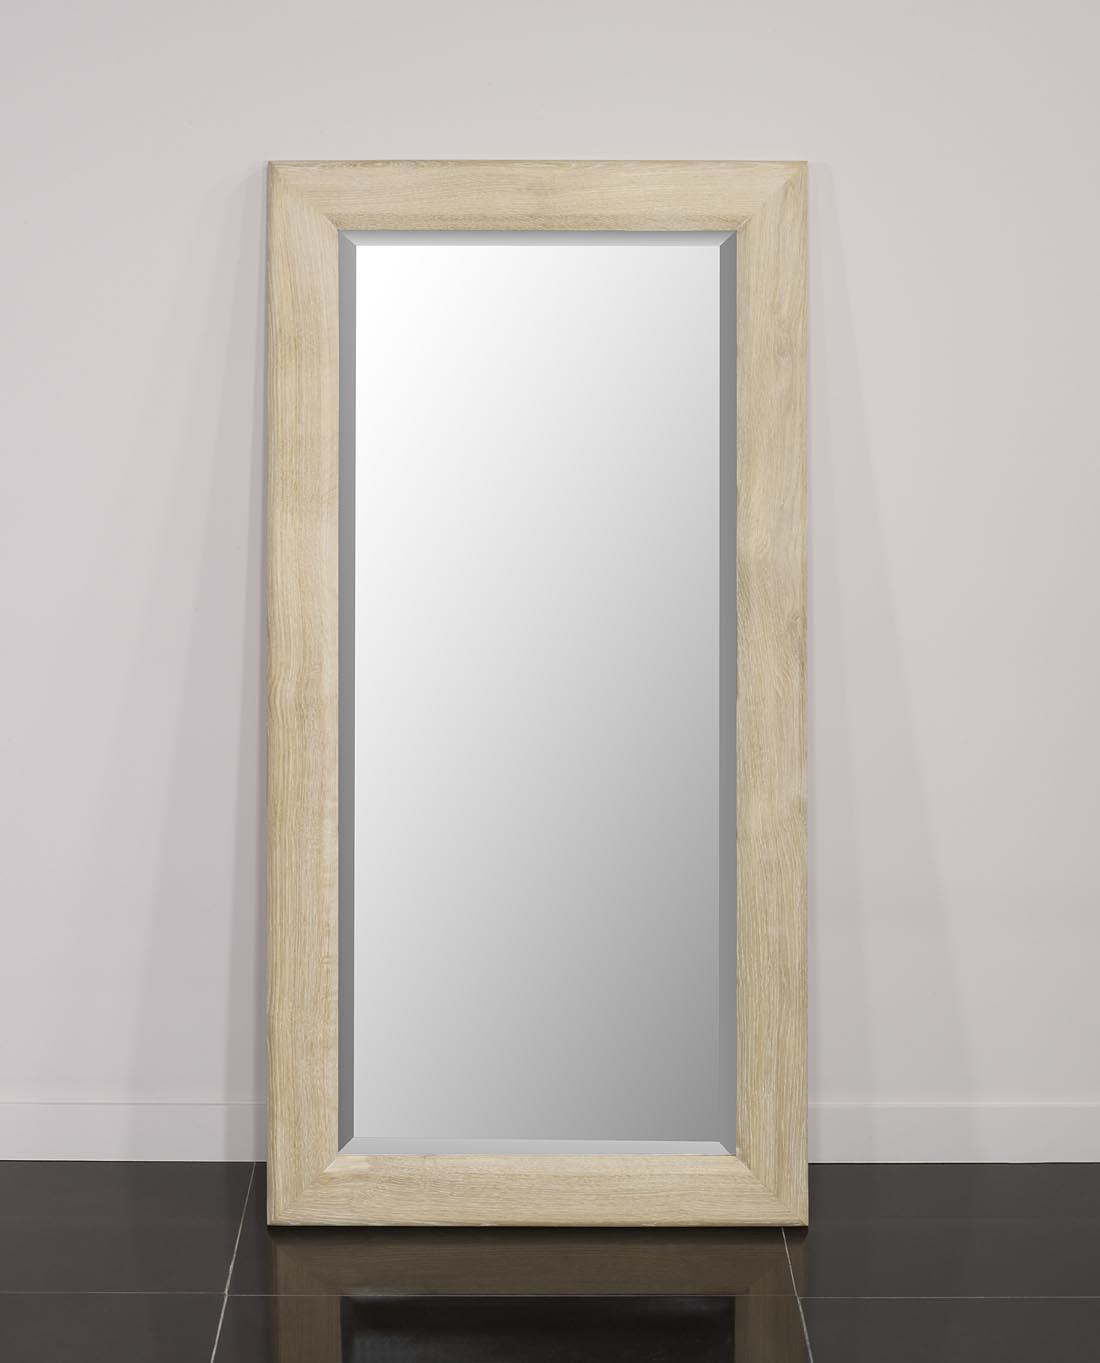 miroir glace biseaut e 120x60 en ch ne massif finition ch ne bross meuble en ch ne massif